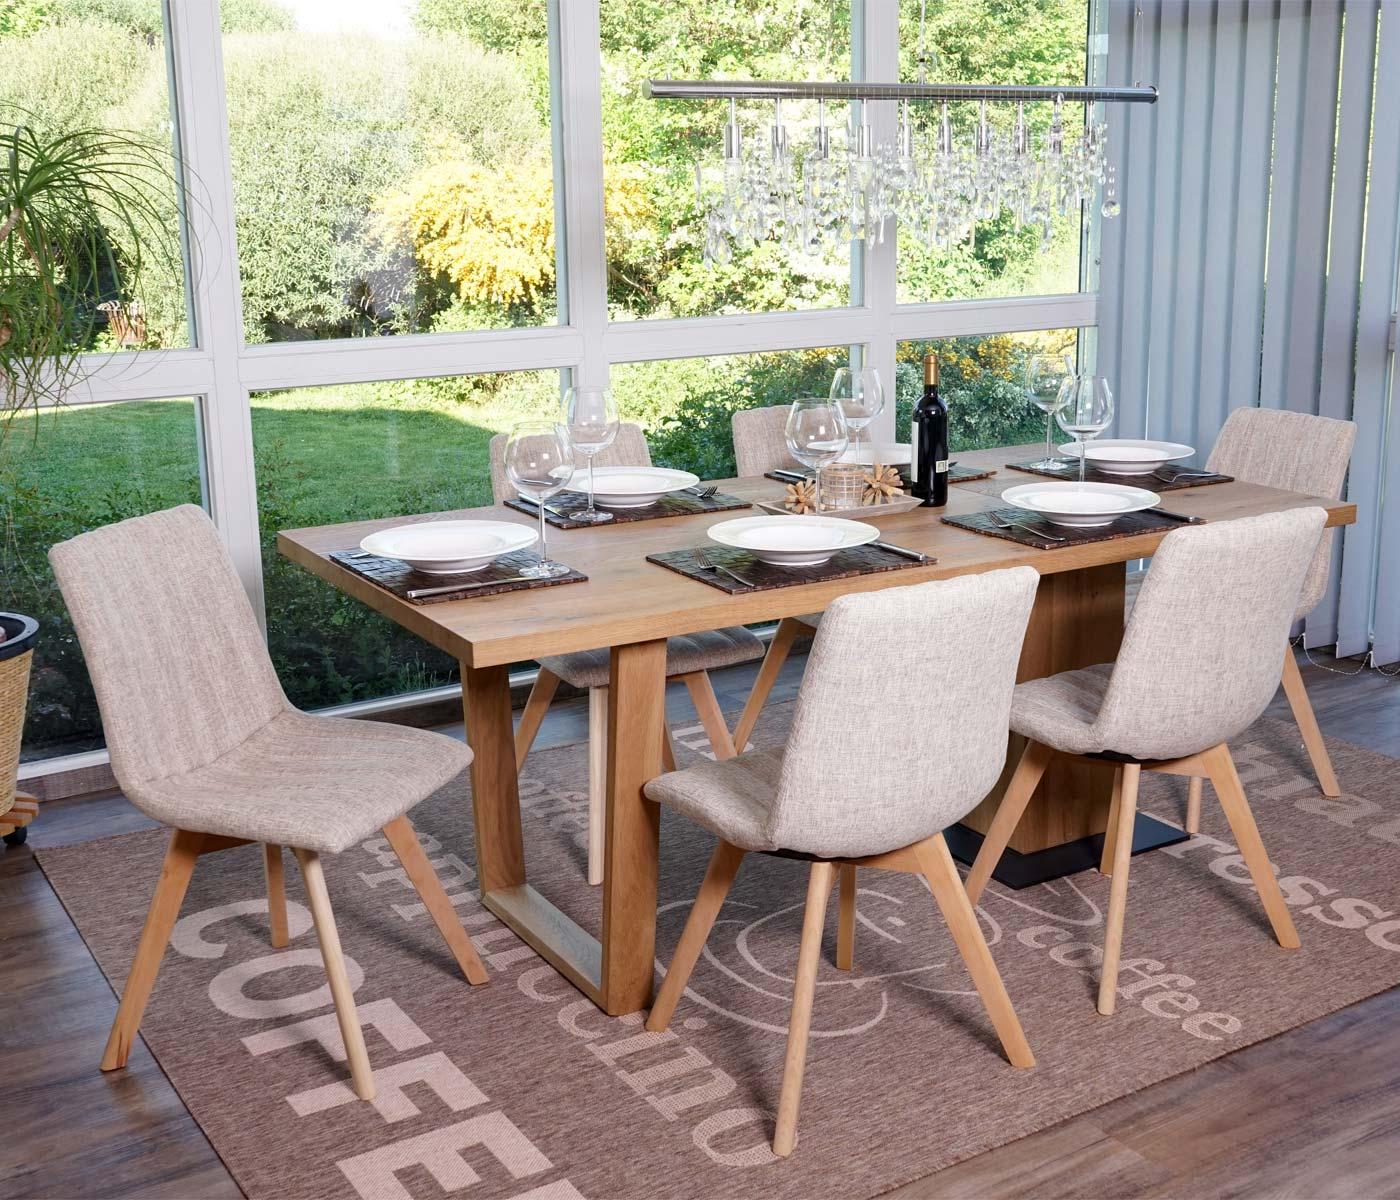 Set 6x sedie sala da pranzo calgary design anni 50 tessuto - Sedie pranzo design ...